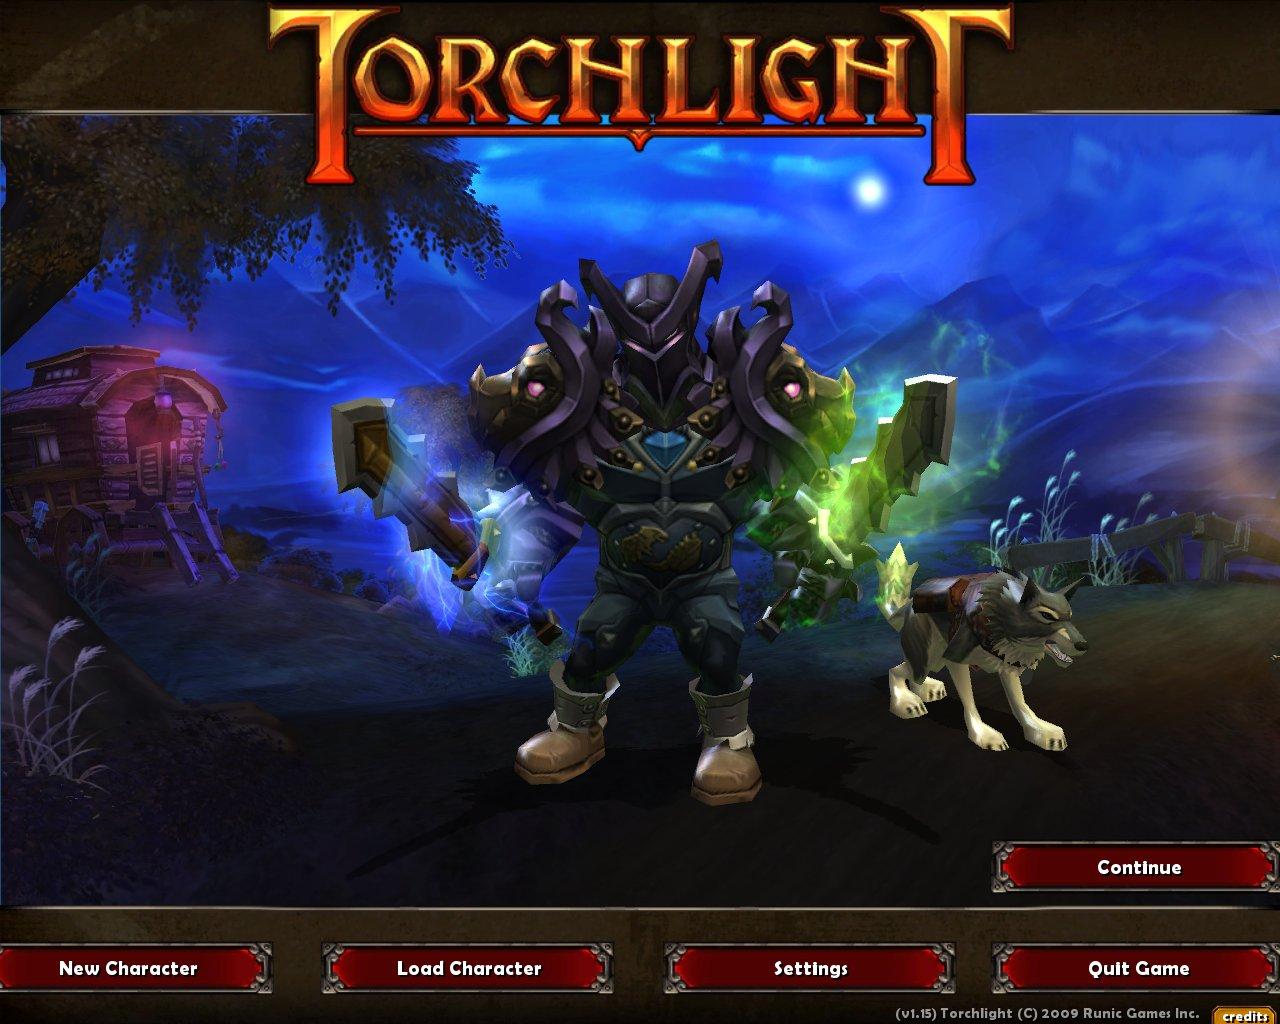 torchlight 2 patch 1.16.2.3